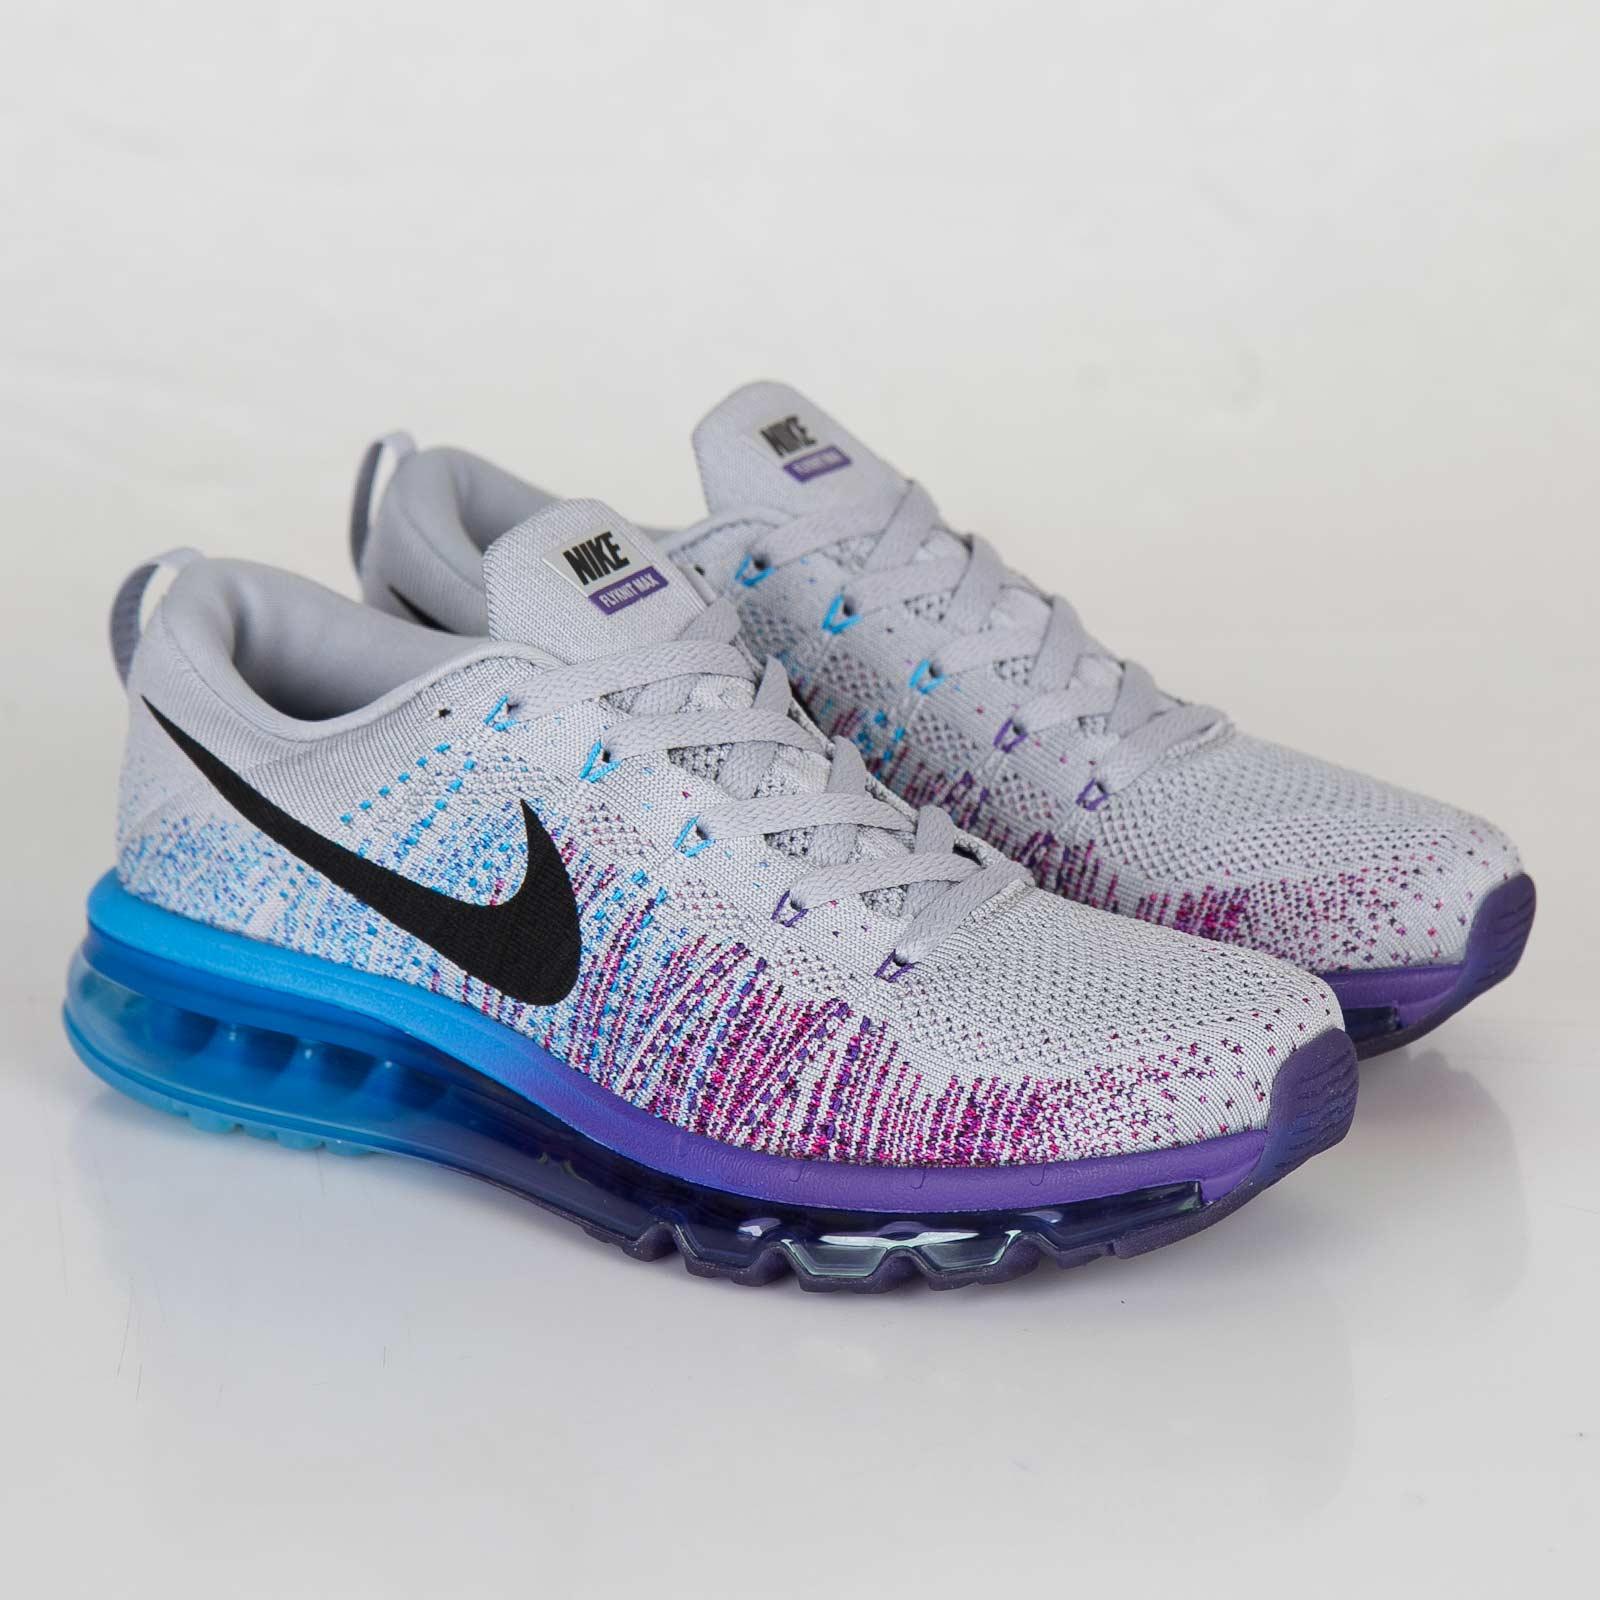 c5cfd01c84 Nike Flyknit Air Max - 620469-005 - Sneakersnstuff   sneakers ...